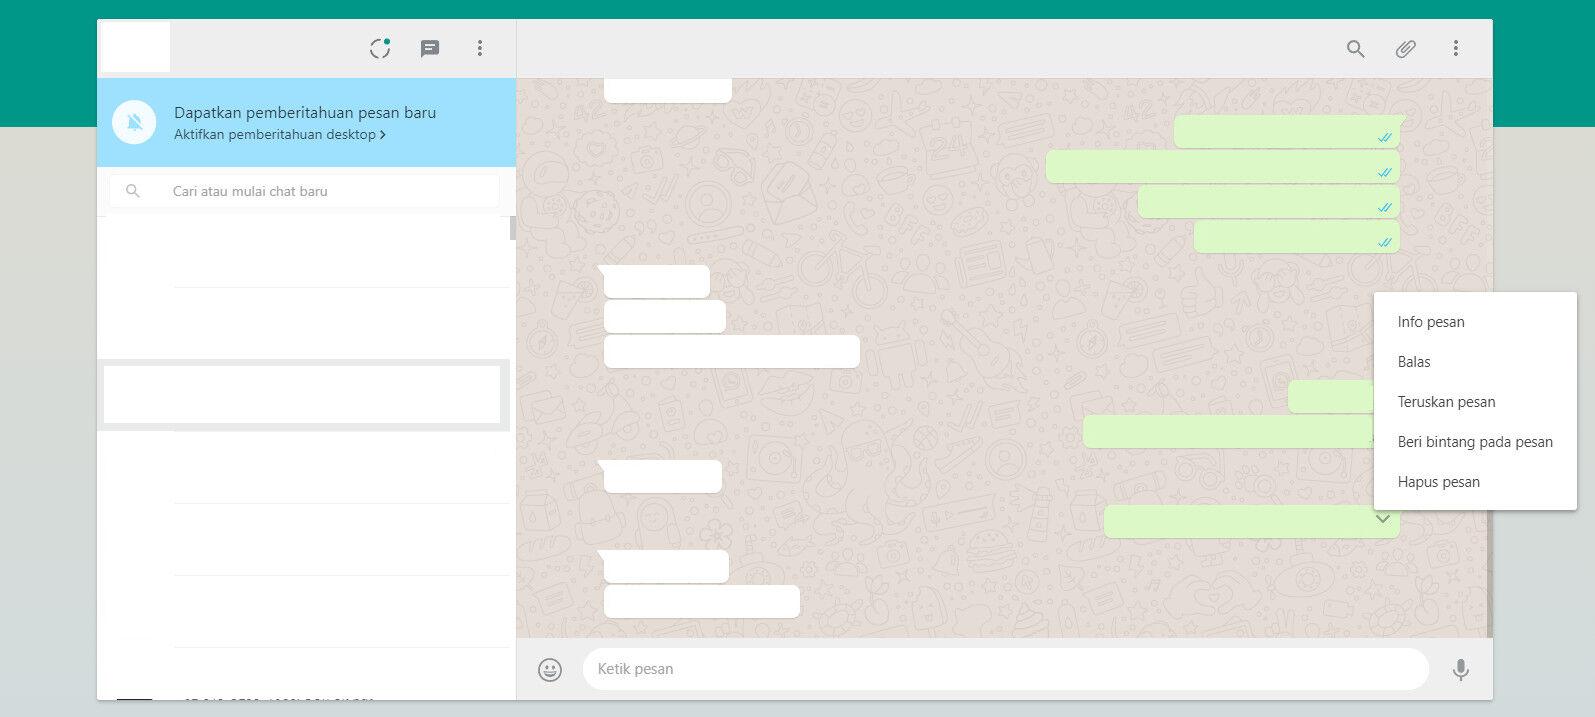 Cara Menarik Pesan Whatsapp Laptop 1 43328